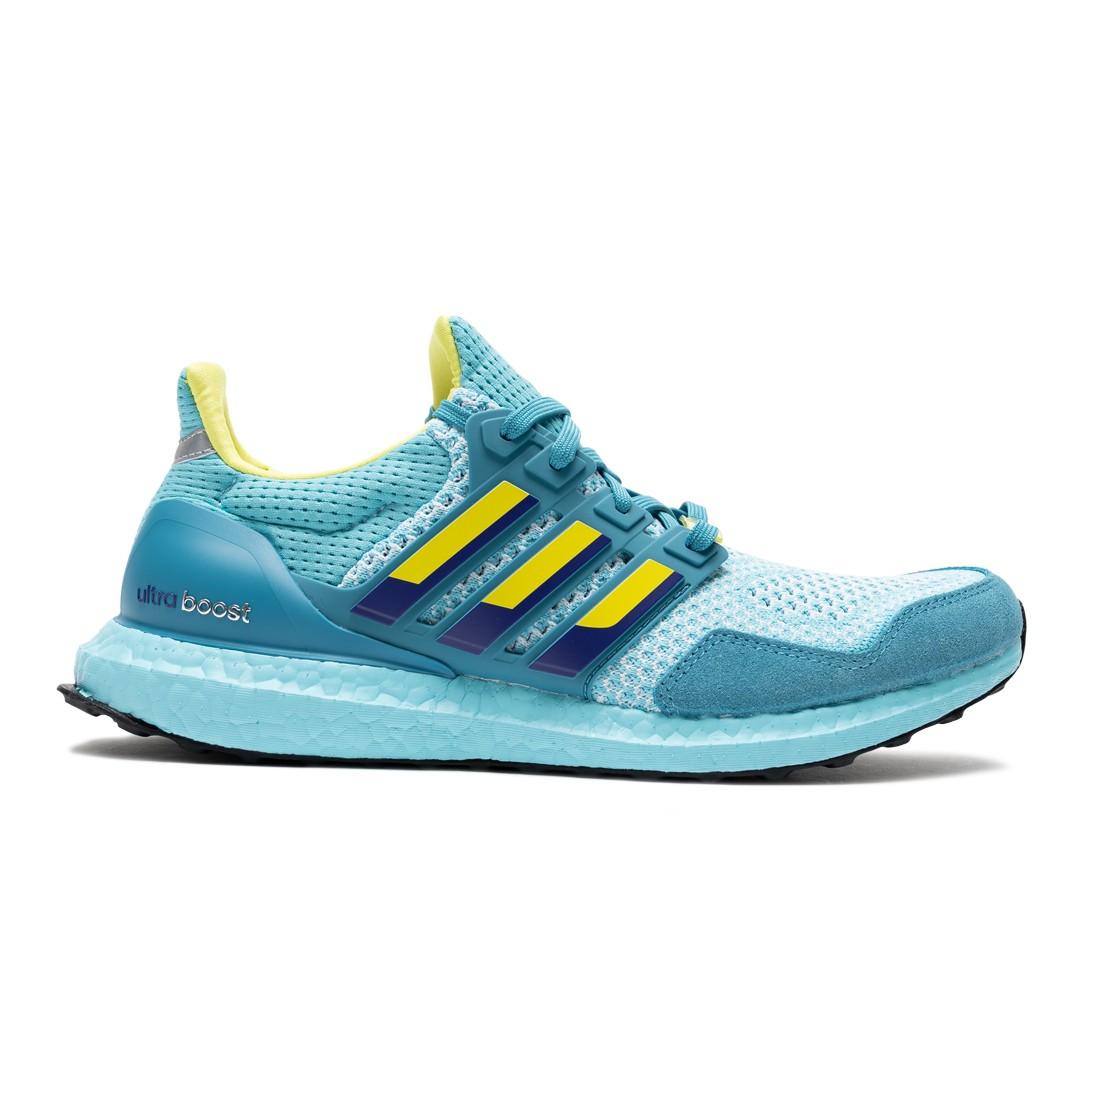 Adidas Men UltraBoost 1.0 DNA (blue / light aqua / shock yellow / unity purple)